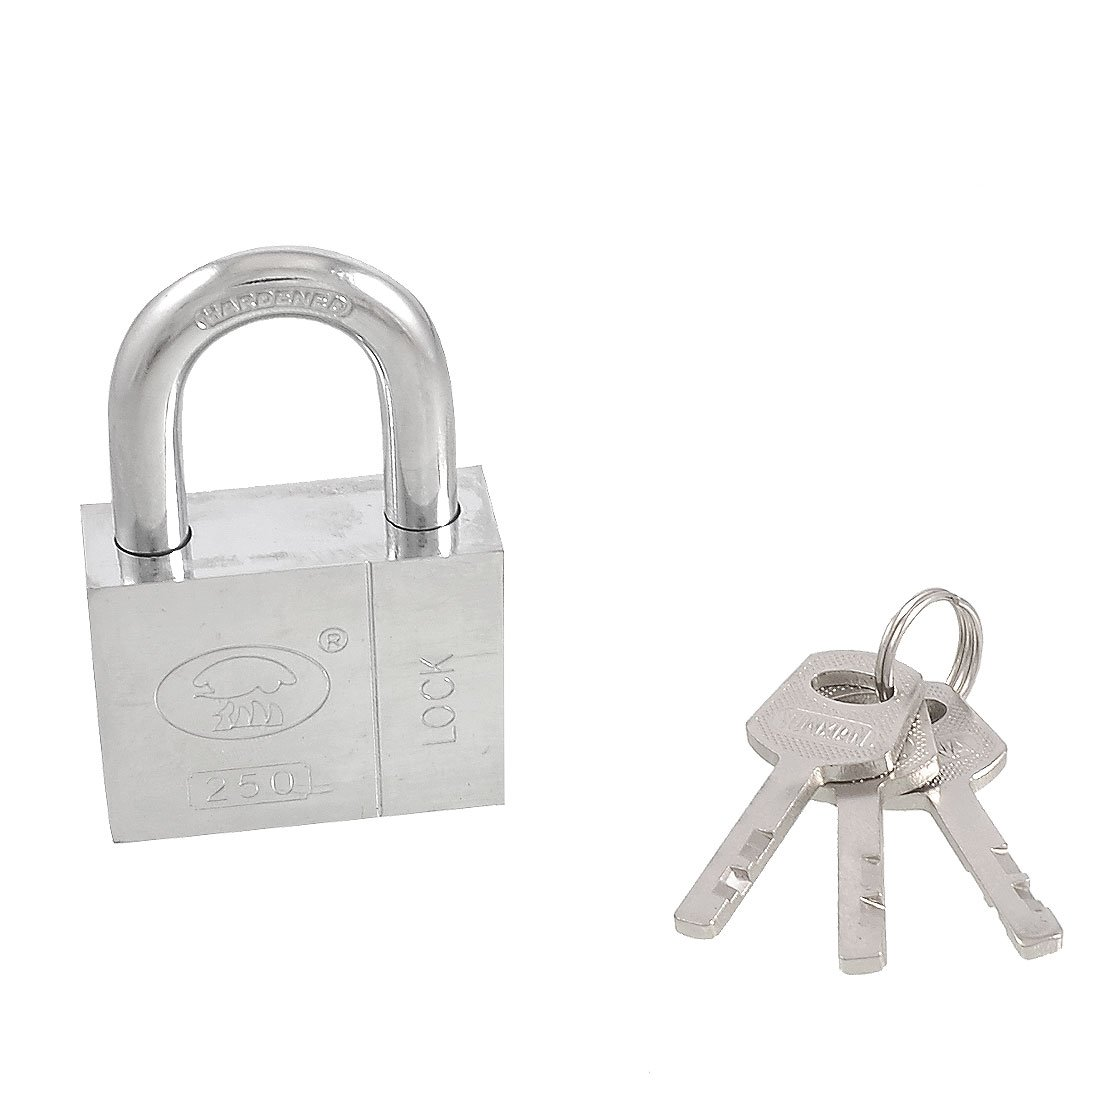 uxcell Home Door Gate 50mm Silver Tone Security Lock Padlock w 3 Keys